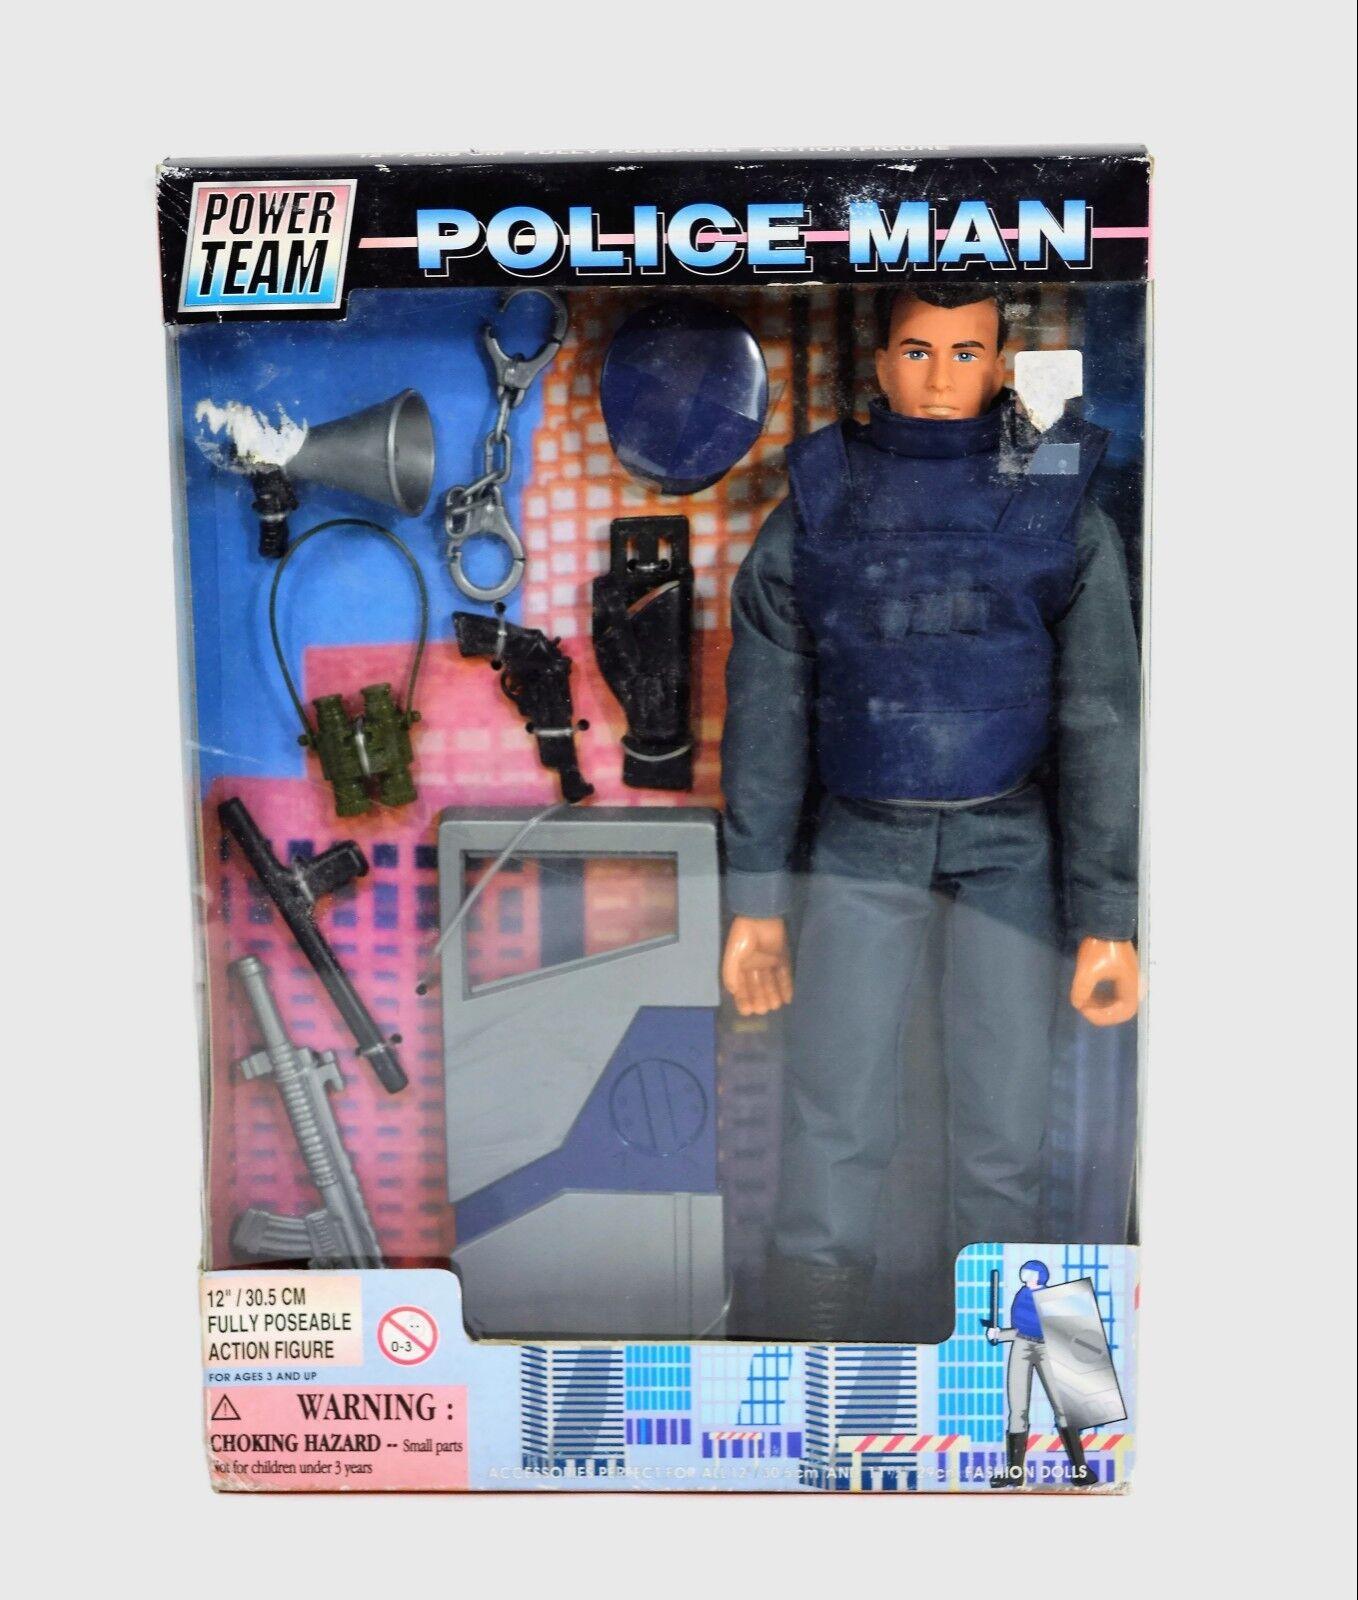 Power Team Team Team Police Man 12 Inch Action Figure  M&C Toy Center 9a3e81